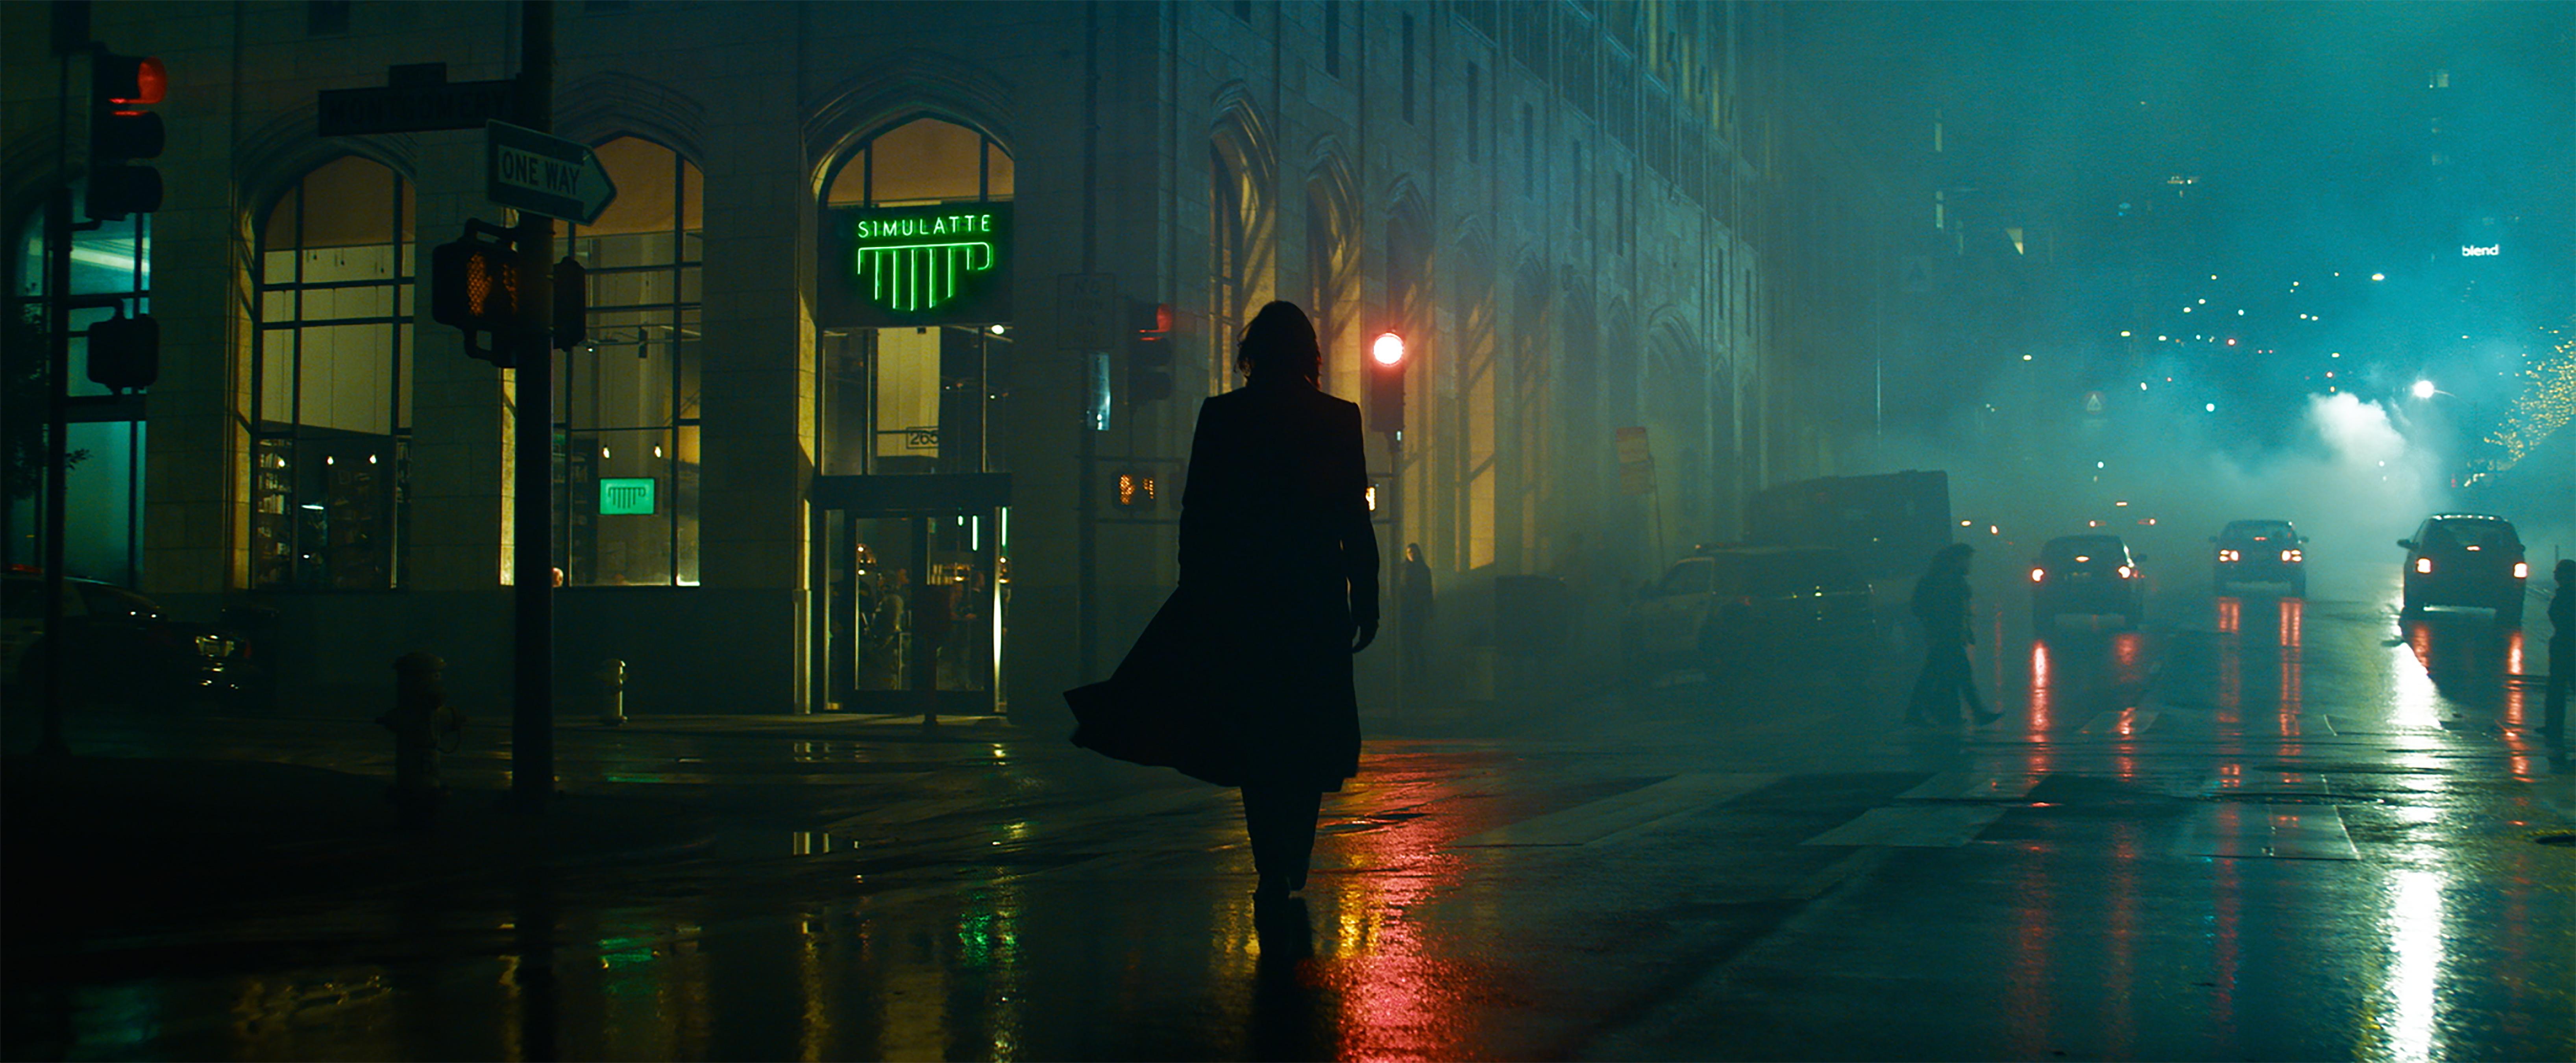 Keanu Reeves returns in The Matrix: Resurrections.